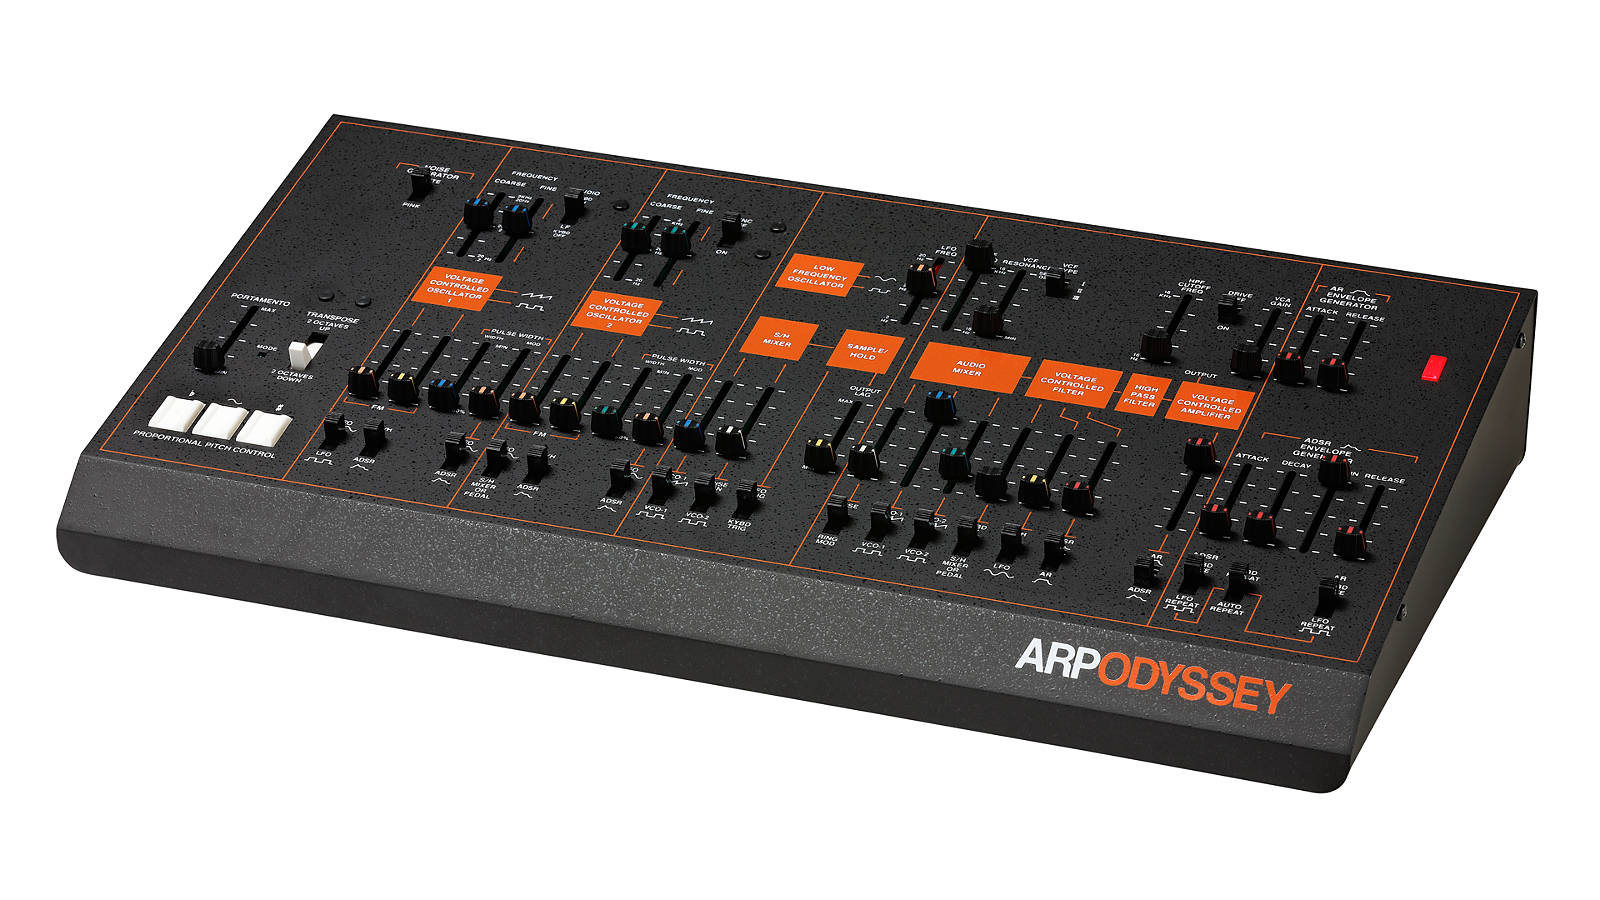 ARP ODYSSEY Module Rev3 Analog Duophonic Synthesizer